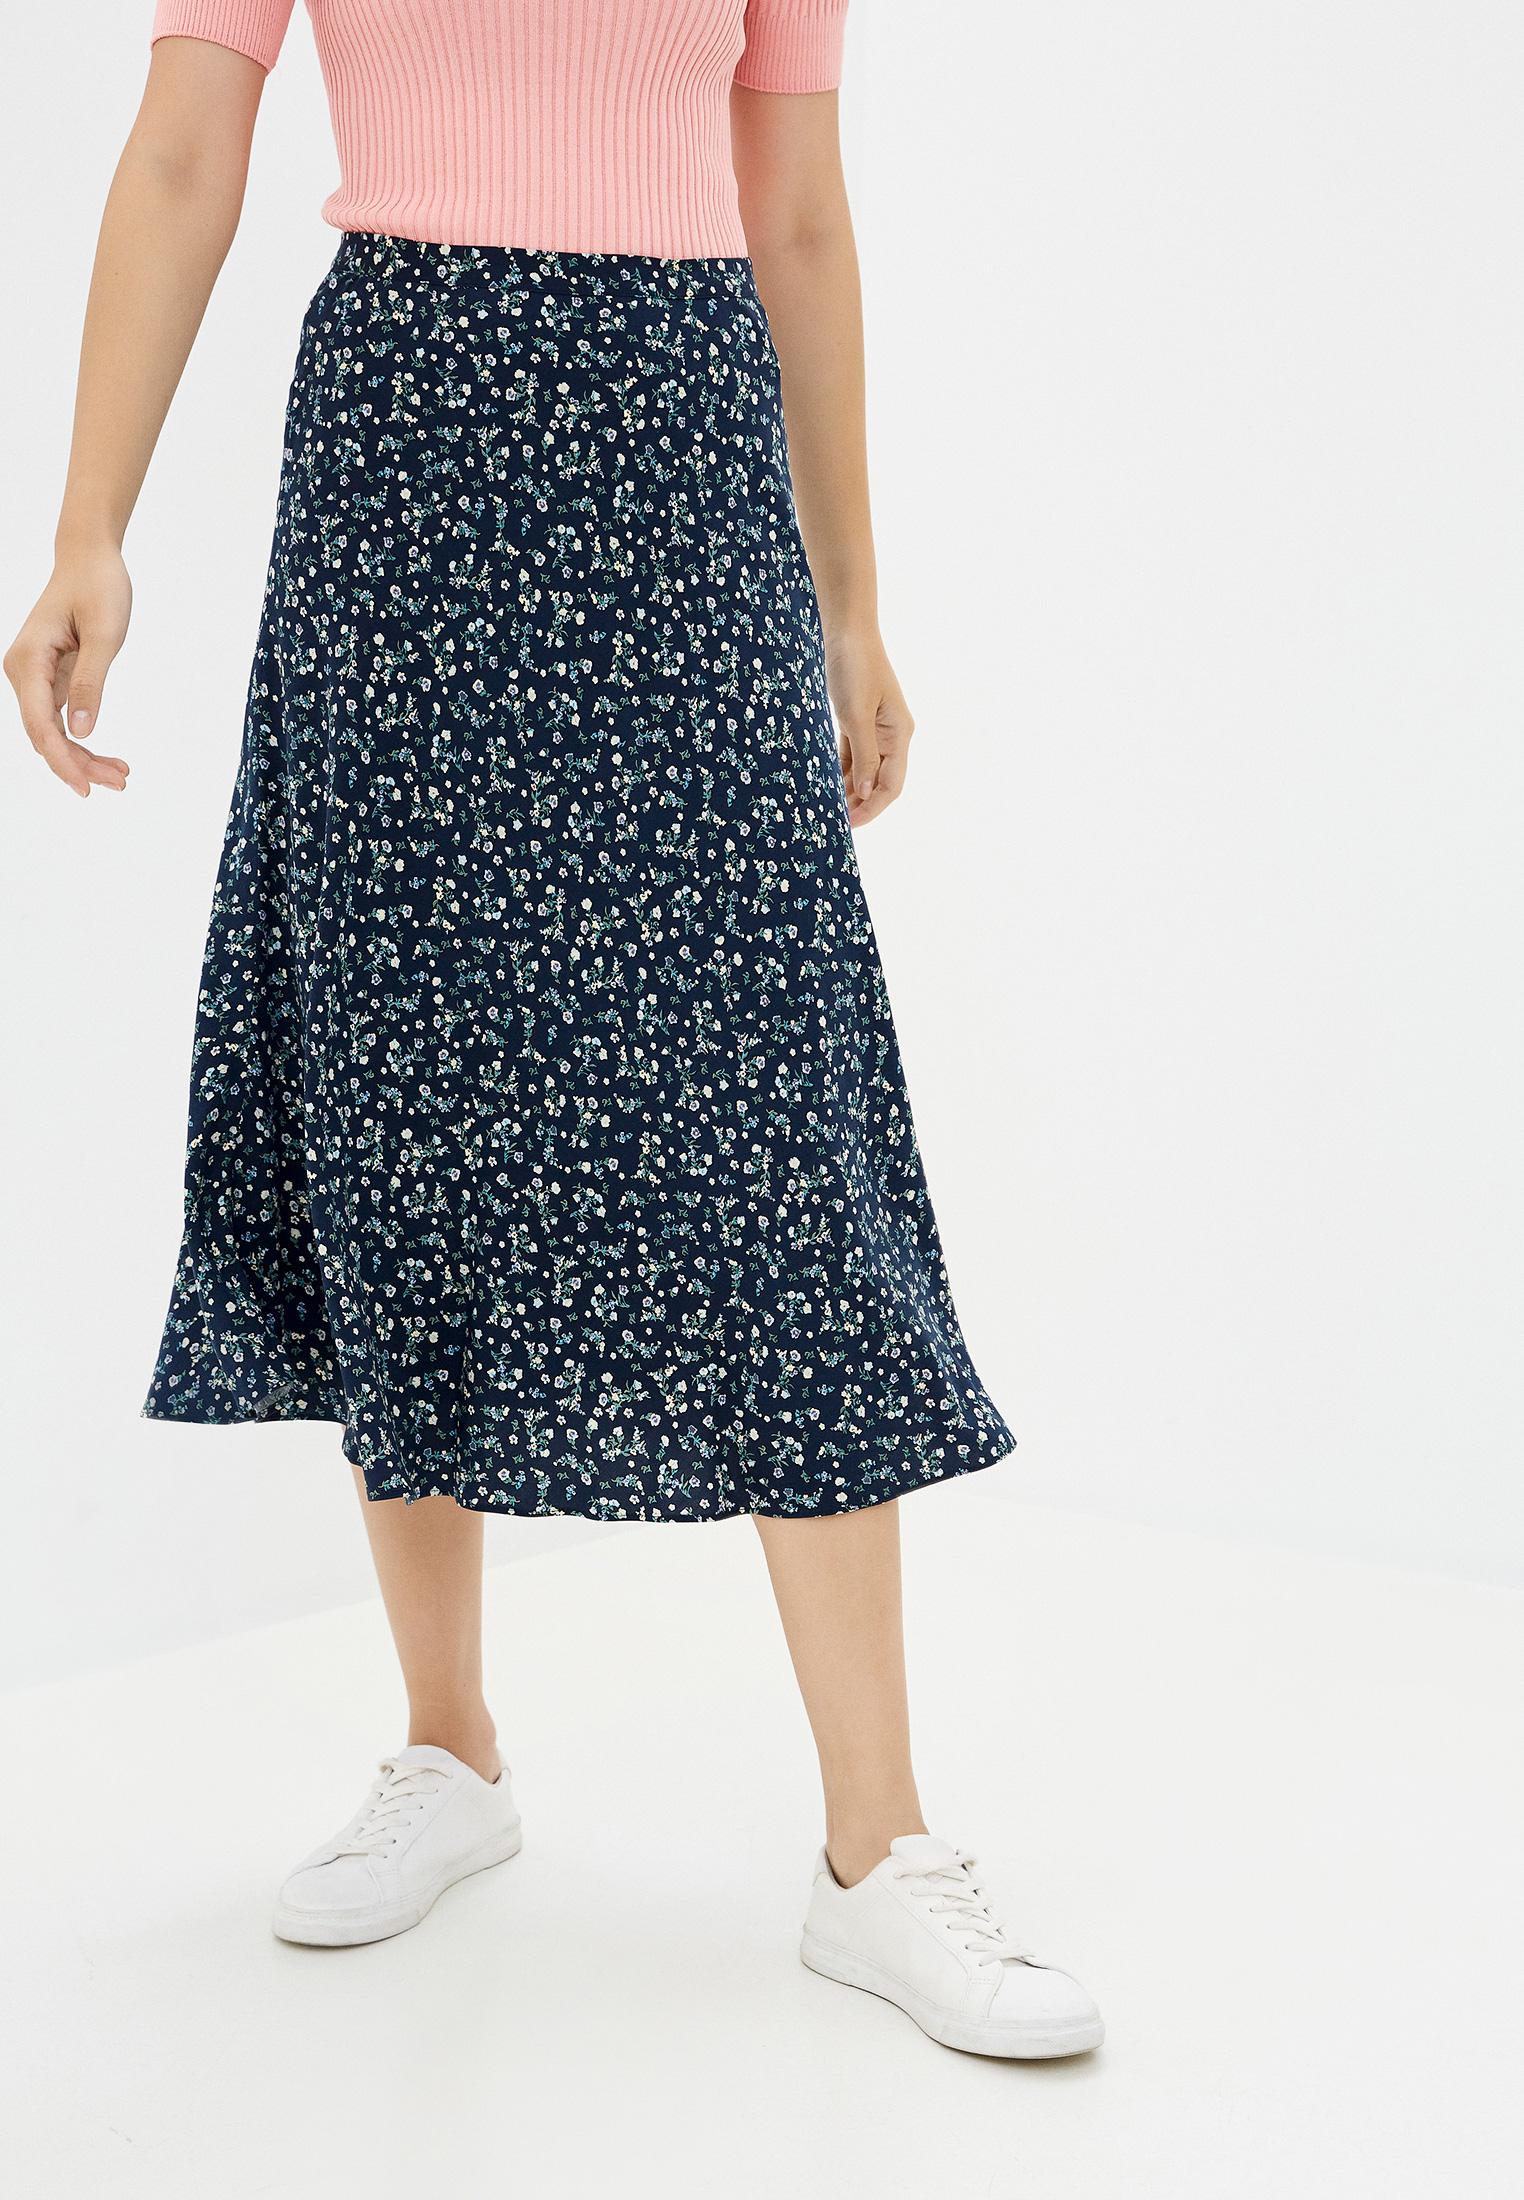 Широкая юбка Tommy Hilfiger (Томми Хилфигер) WW0WW28196